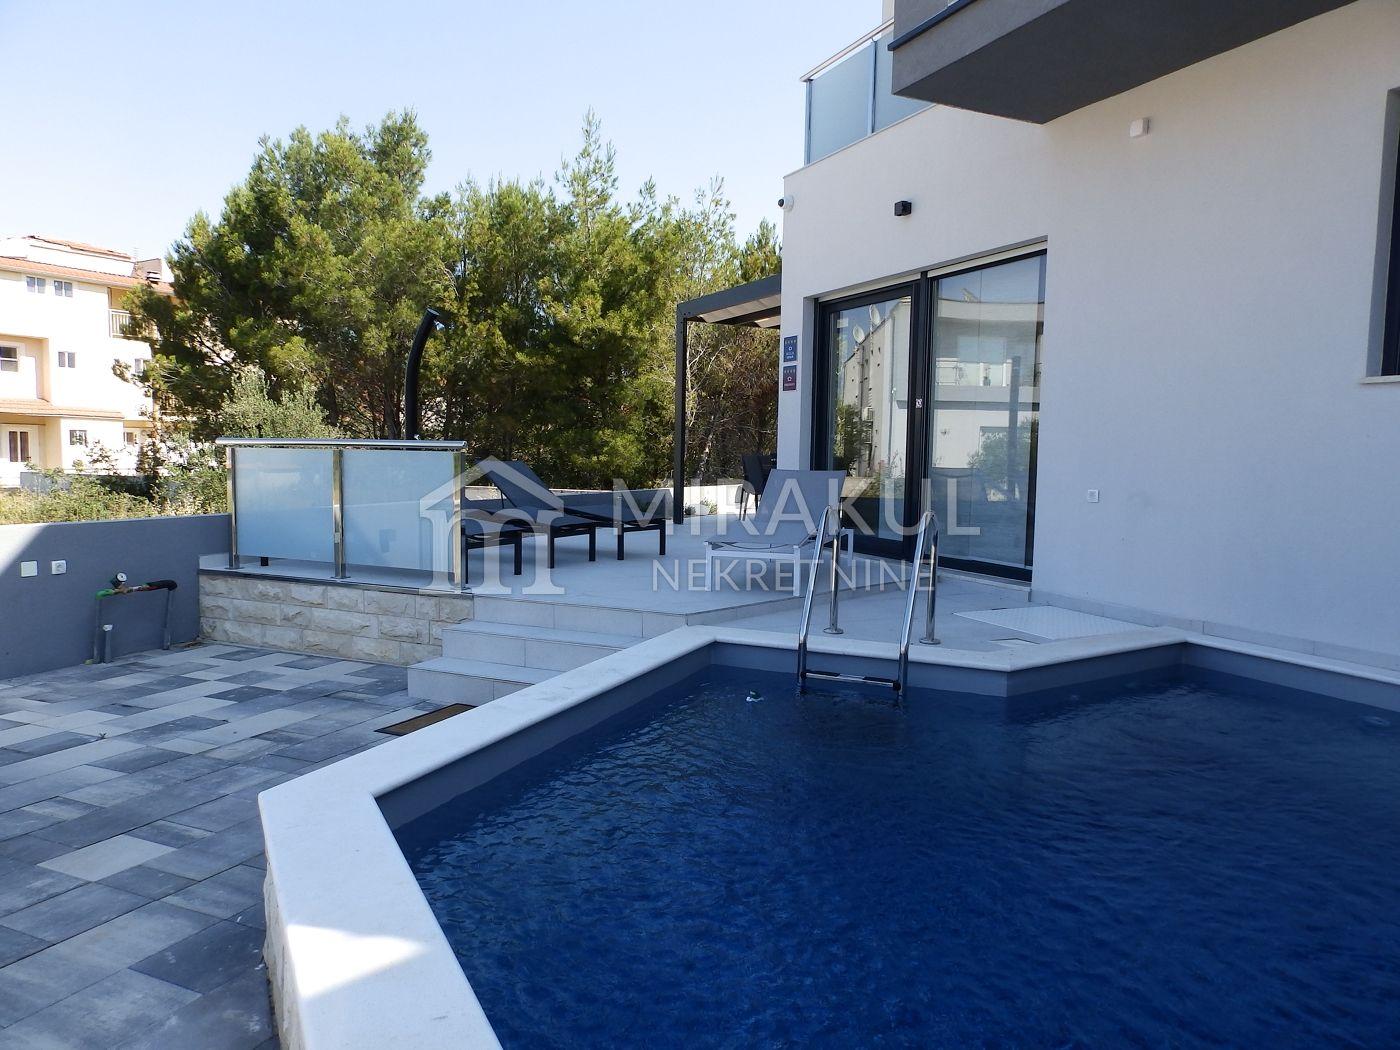 Properties Srima Croatia, Mirakul Real Estate agency, AS-751, Luxurious flat with a pool 1